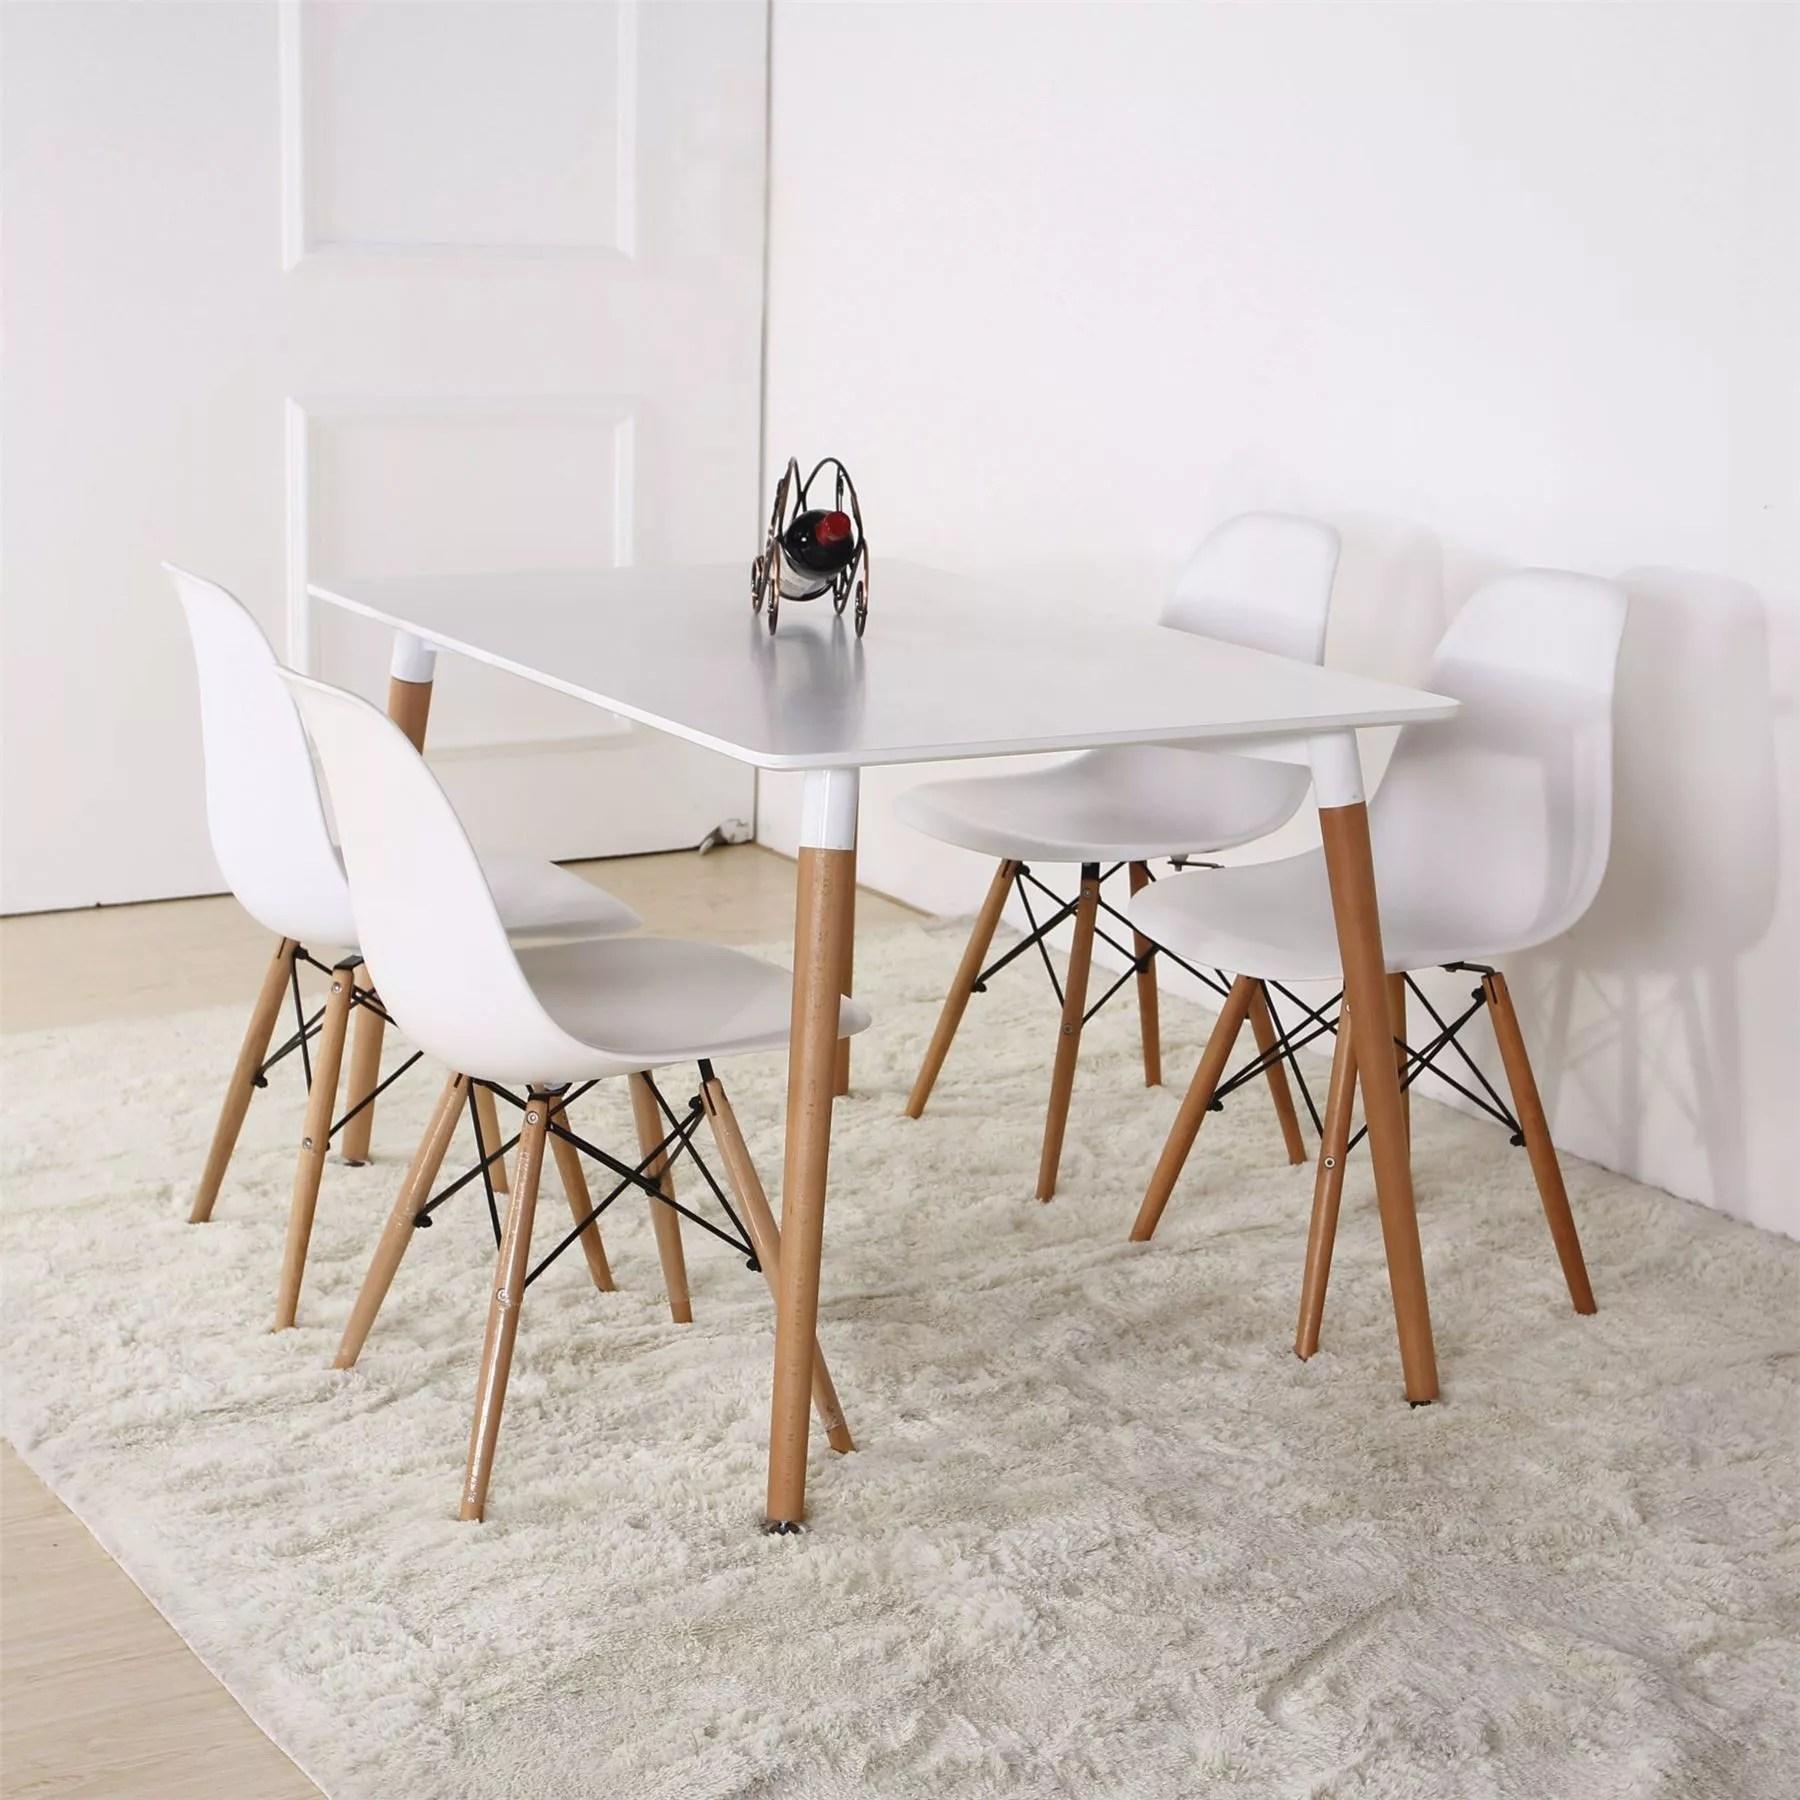 dsw eamess daw table carre en bois et polypropylene 80x80 pour bar cafe